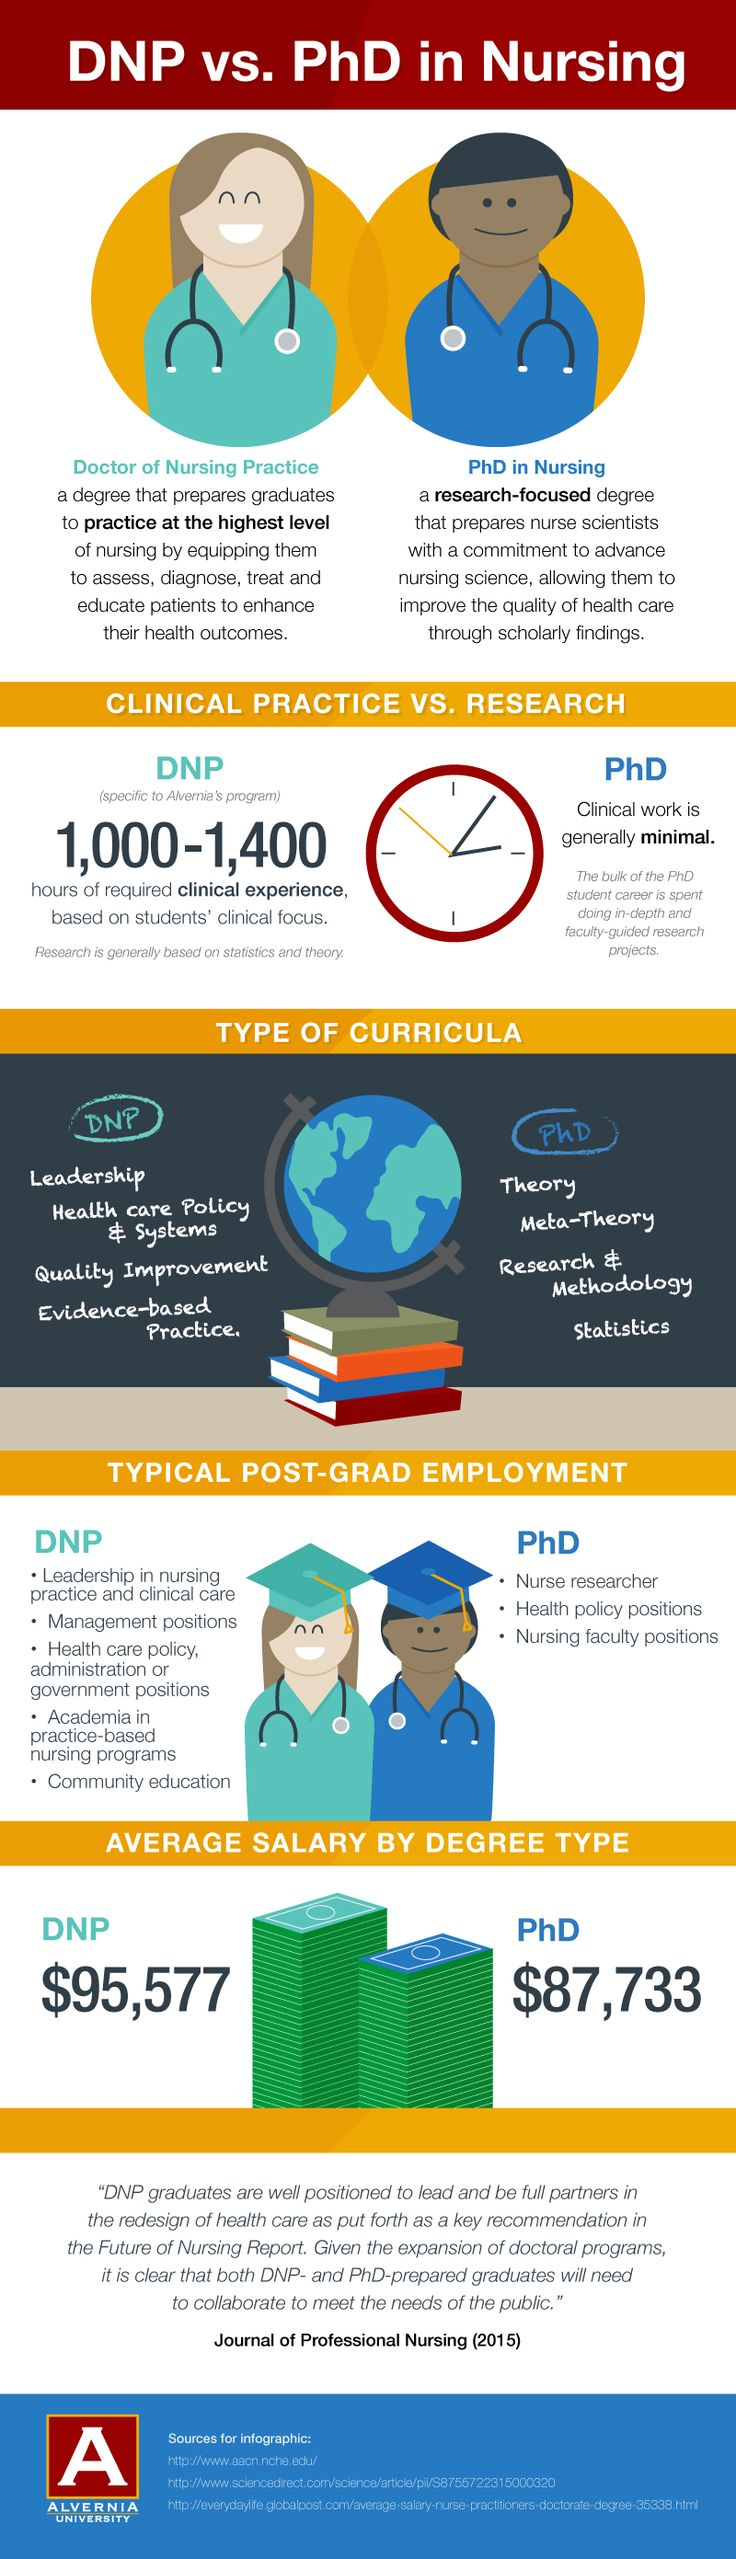 Marvelous PhD In Nursing Inforgraphic   Find Top Nursing Jobs At Nurse Recruiter